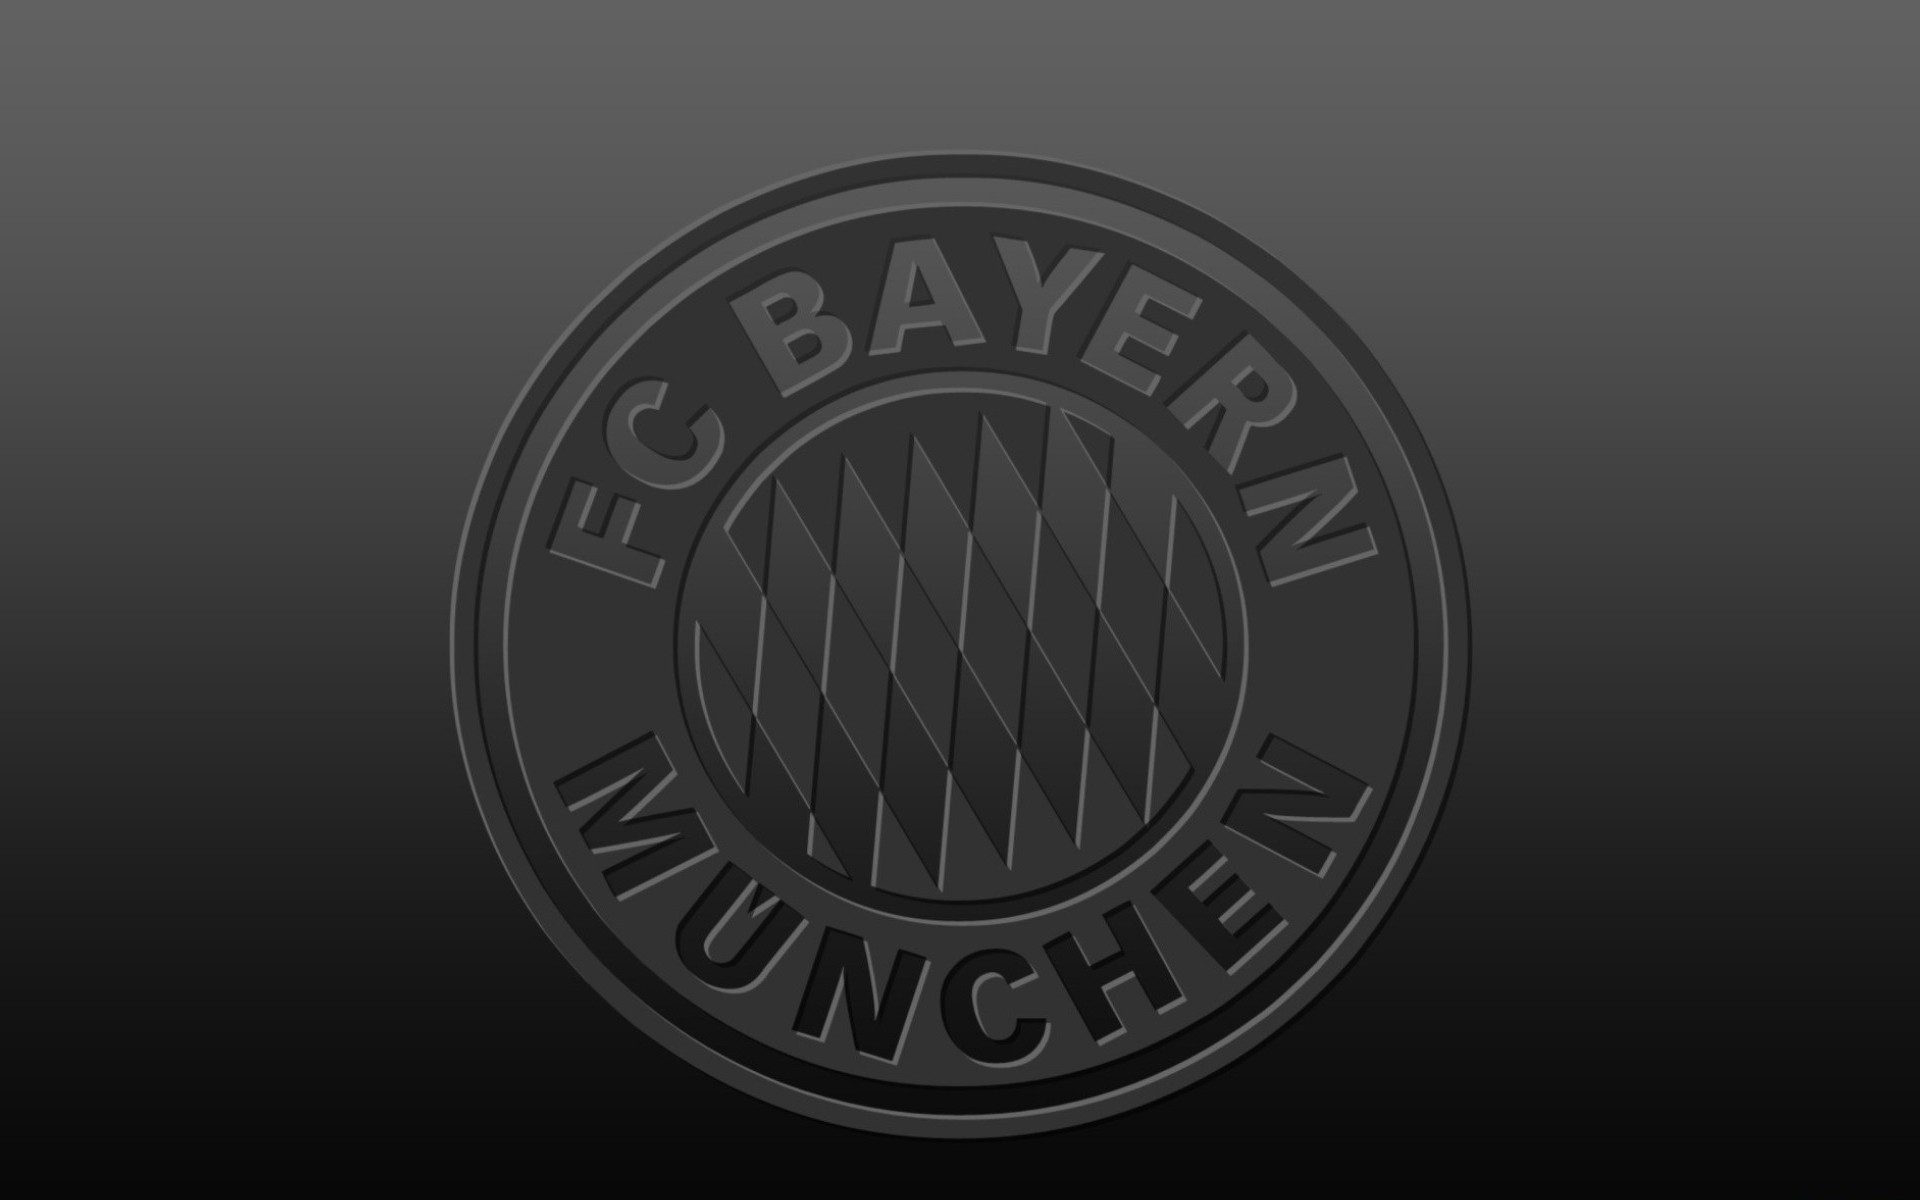 Fc bayern munich full hd wallpaper and background image sports fc bayern munich bayern munich wallpaper voltagebd Images